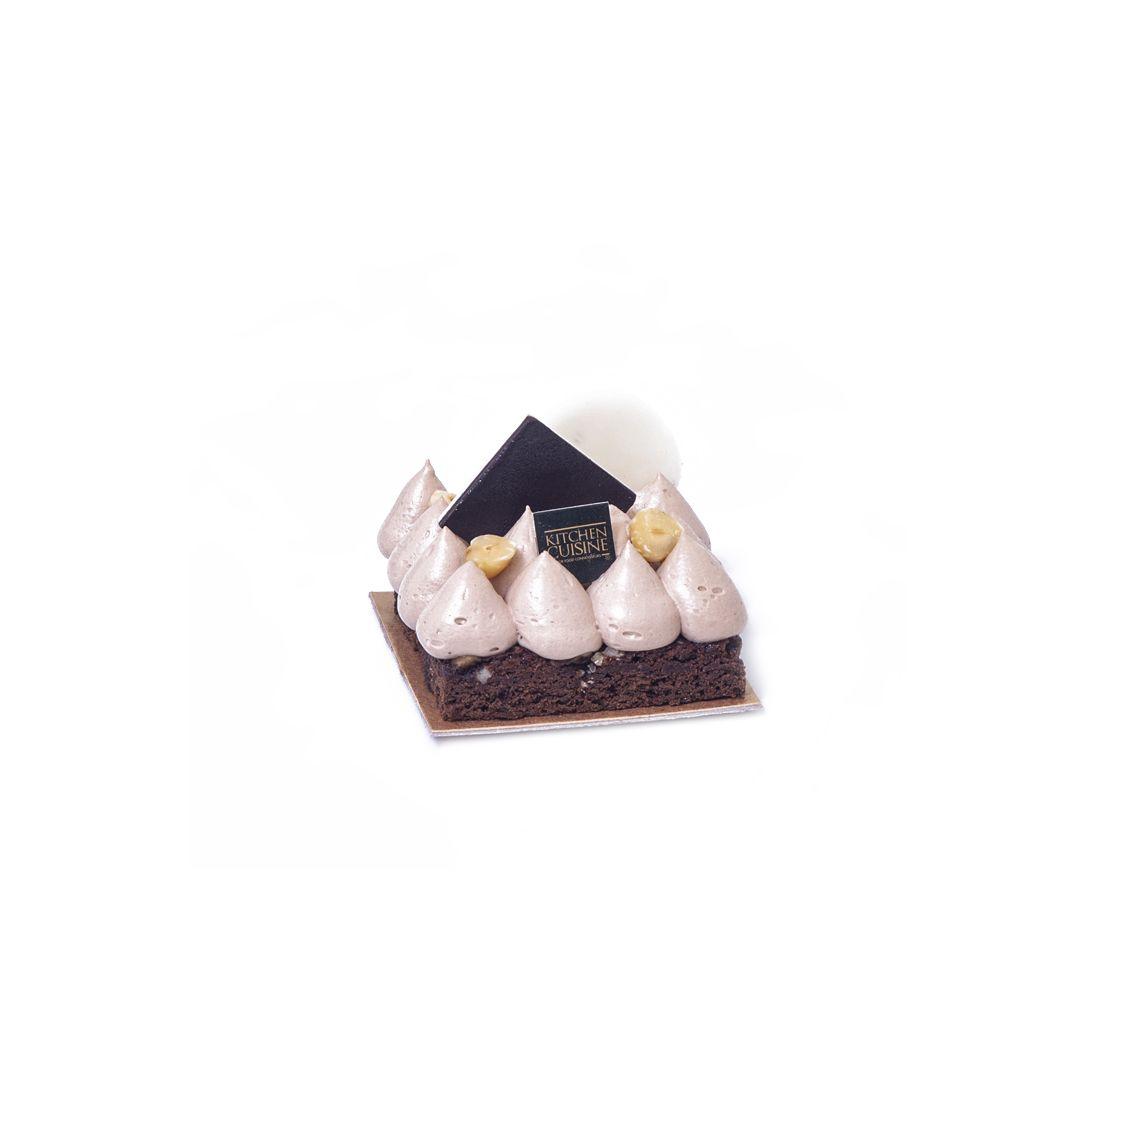 Kitchen Cuisine Default Category Fudge Brownie With Hazelnut Mousse